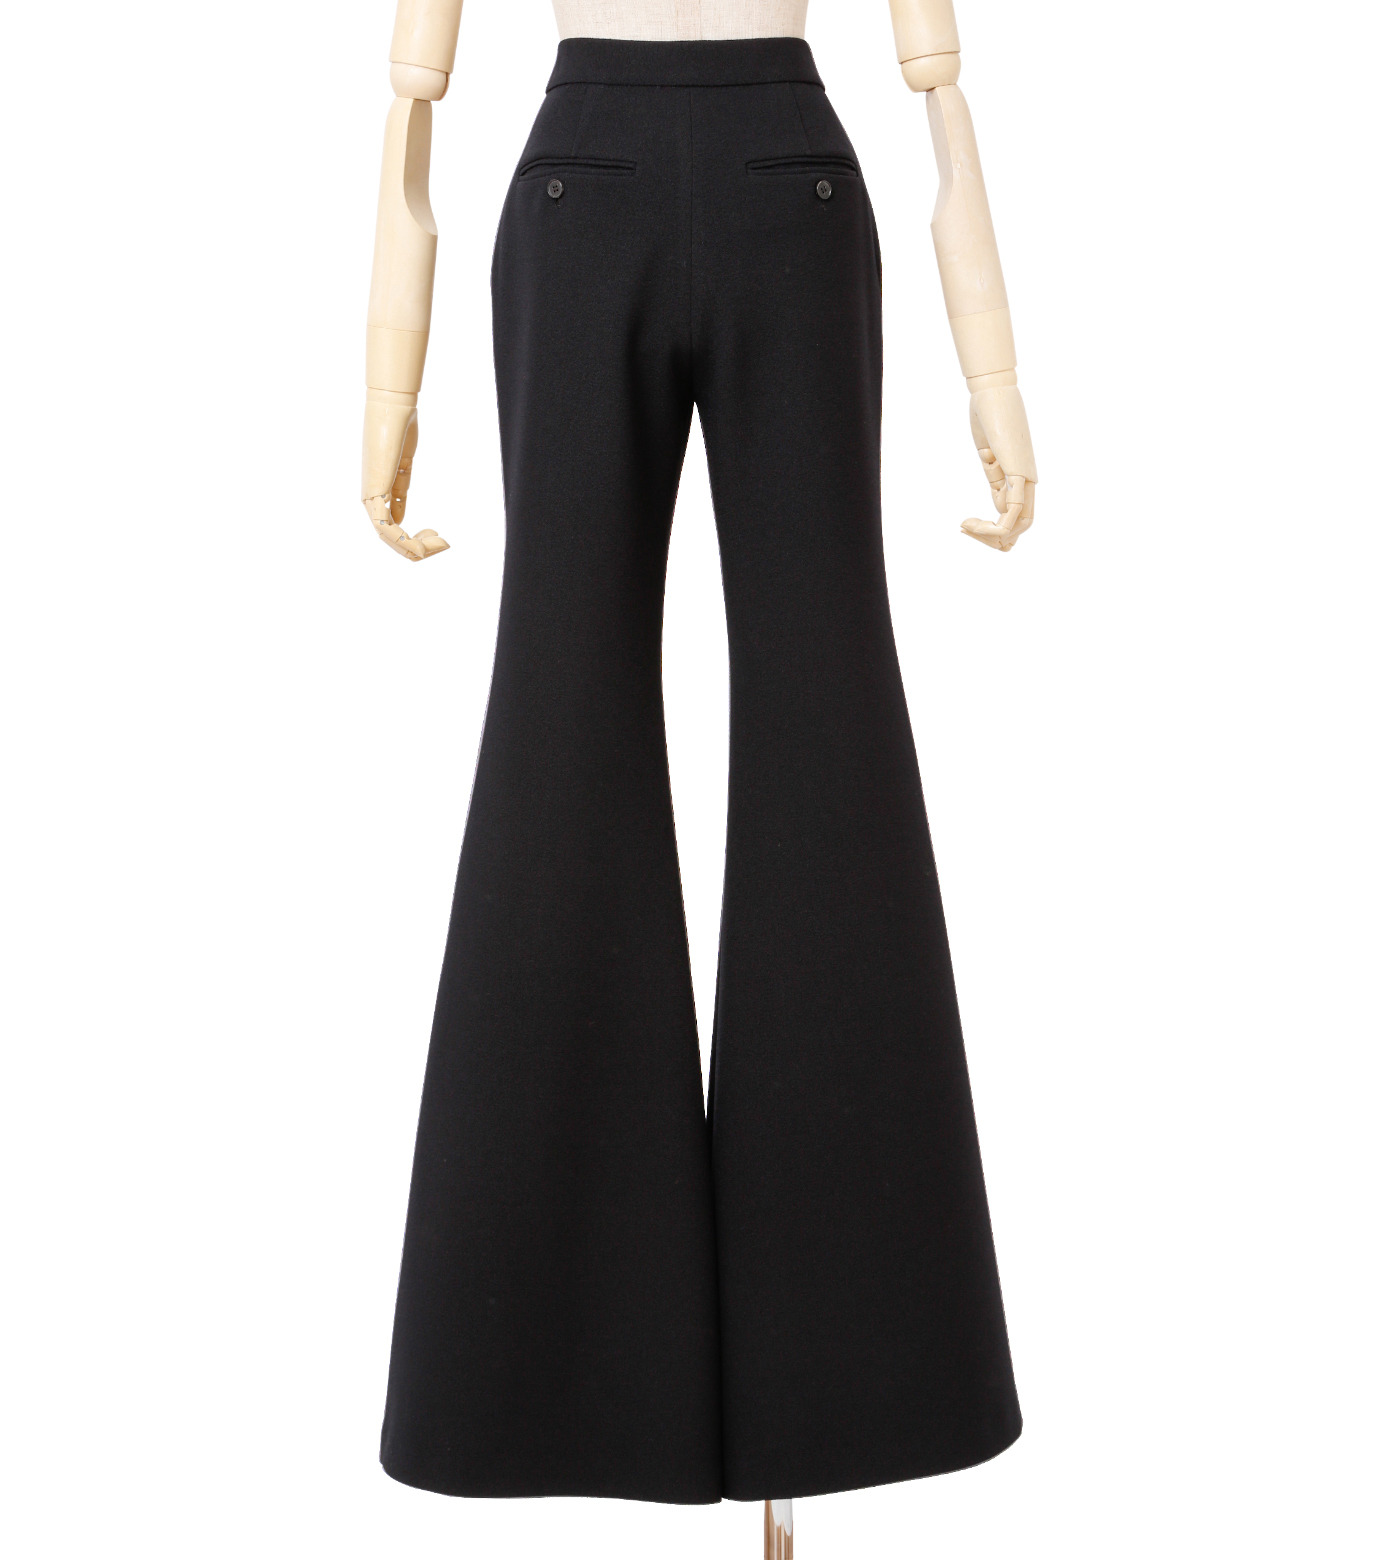 IRENE(アイレネ)のトランペットトラウザー-BLACK(パンツ/pants)-18A88002 拡大詳細画像3